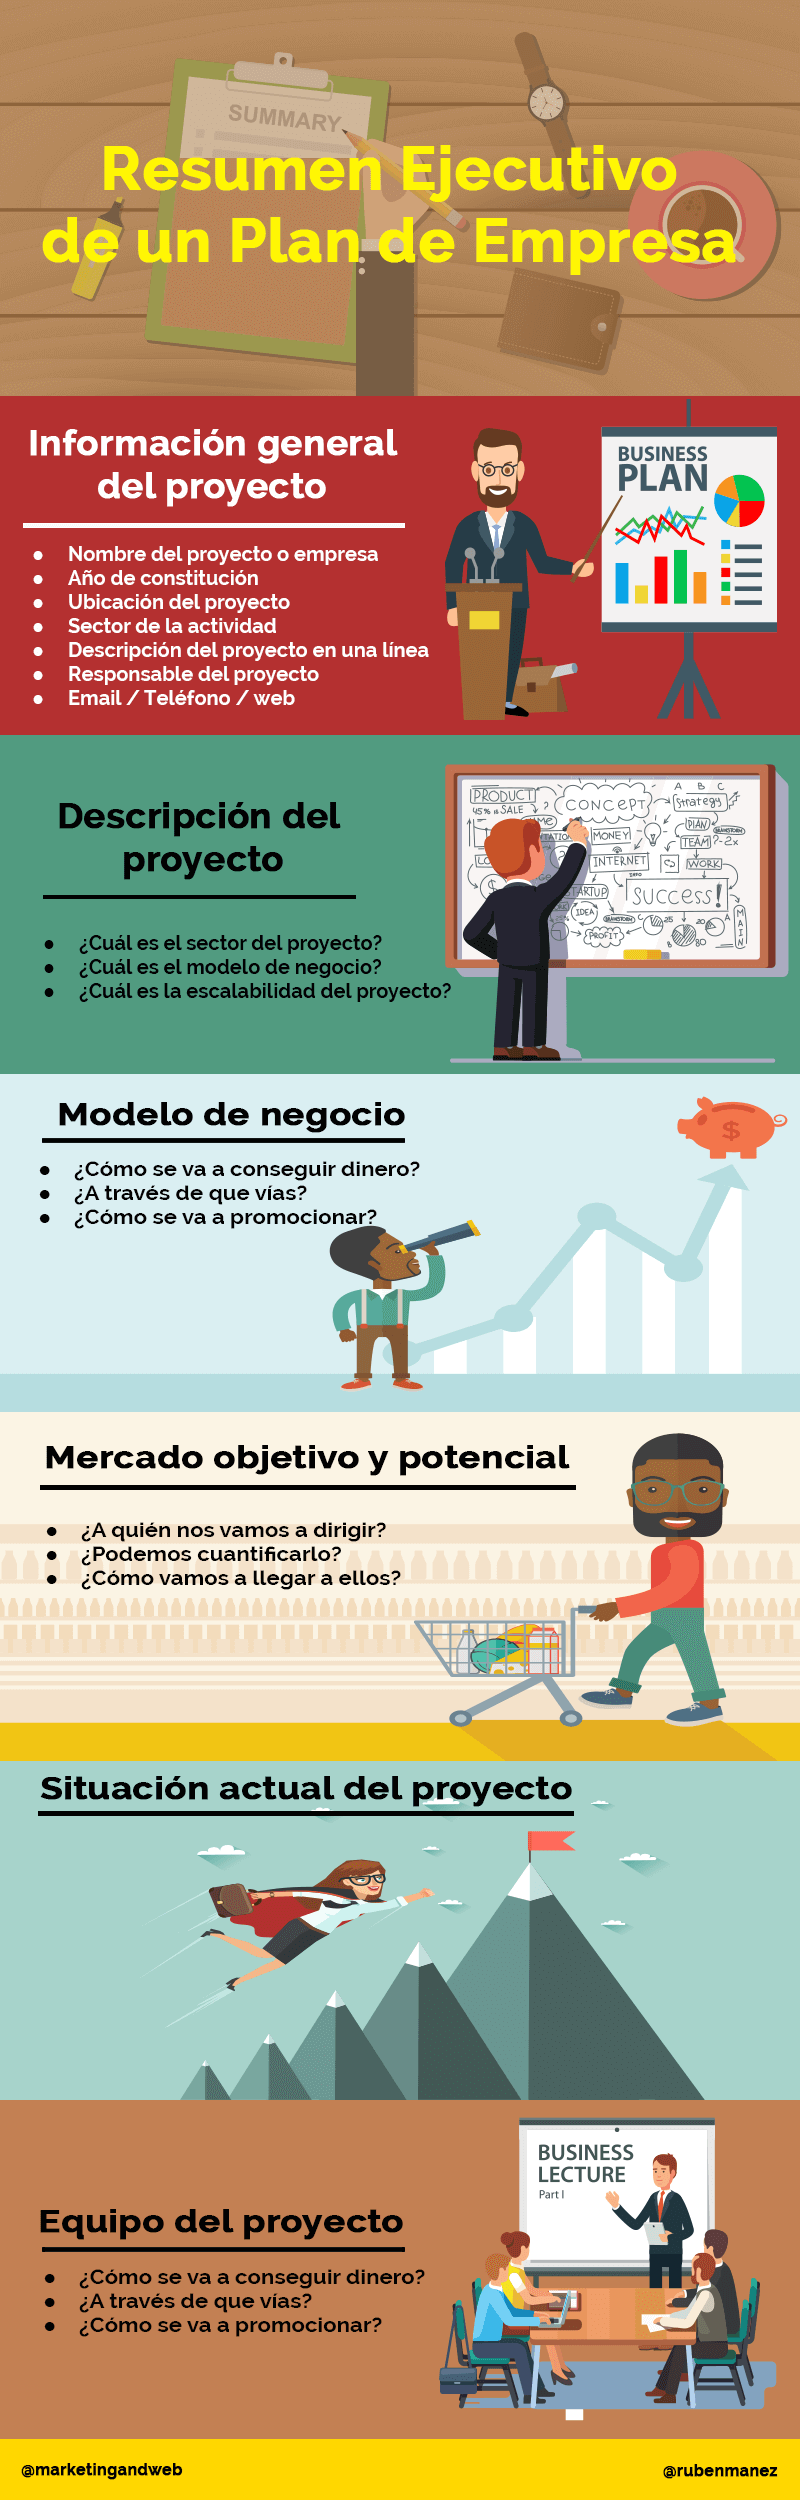 http://www.marketingandweb.es/wp-content/uploads/2017/09/resumen-ejecutivo.png